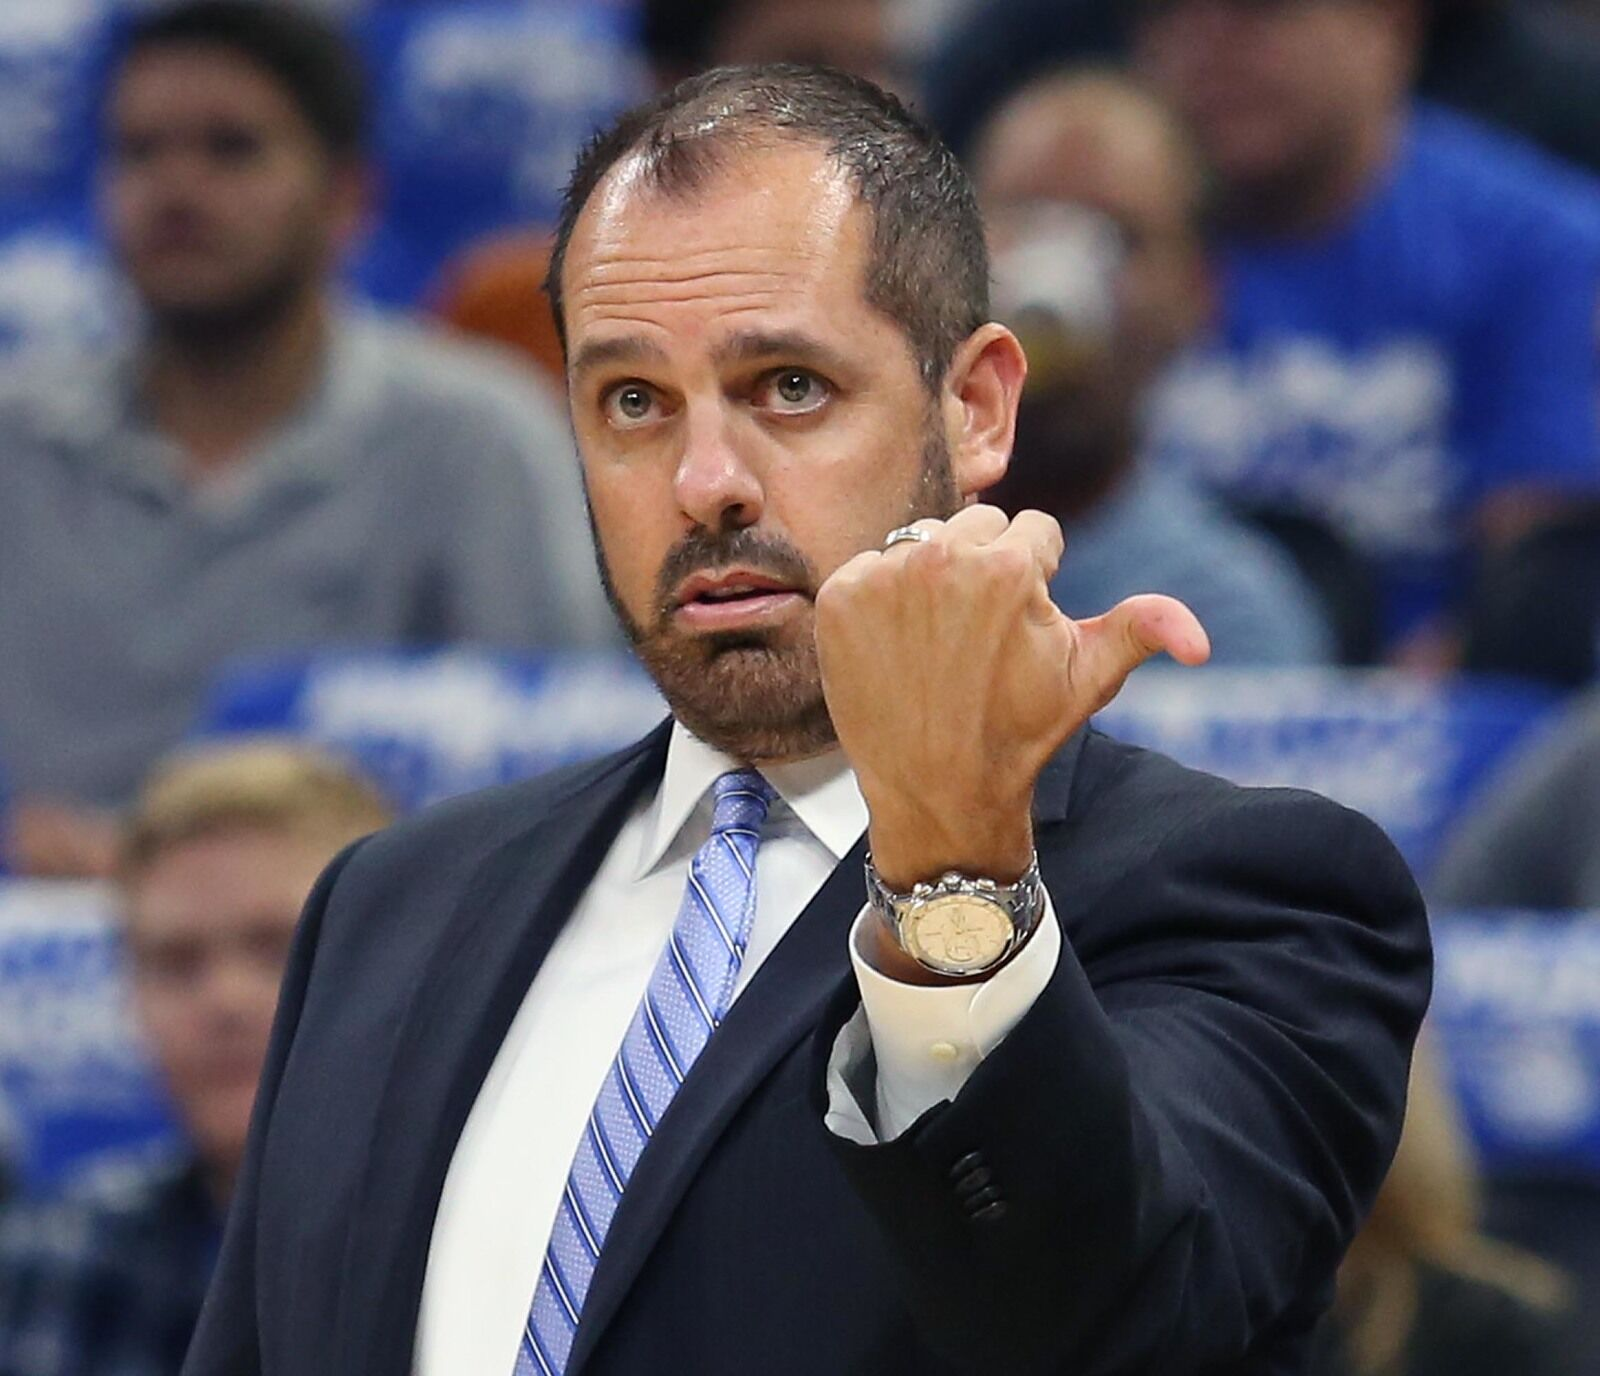 Los Angeles Lakers: Grading the Frank Vogel, Jason Kidd hirings